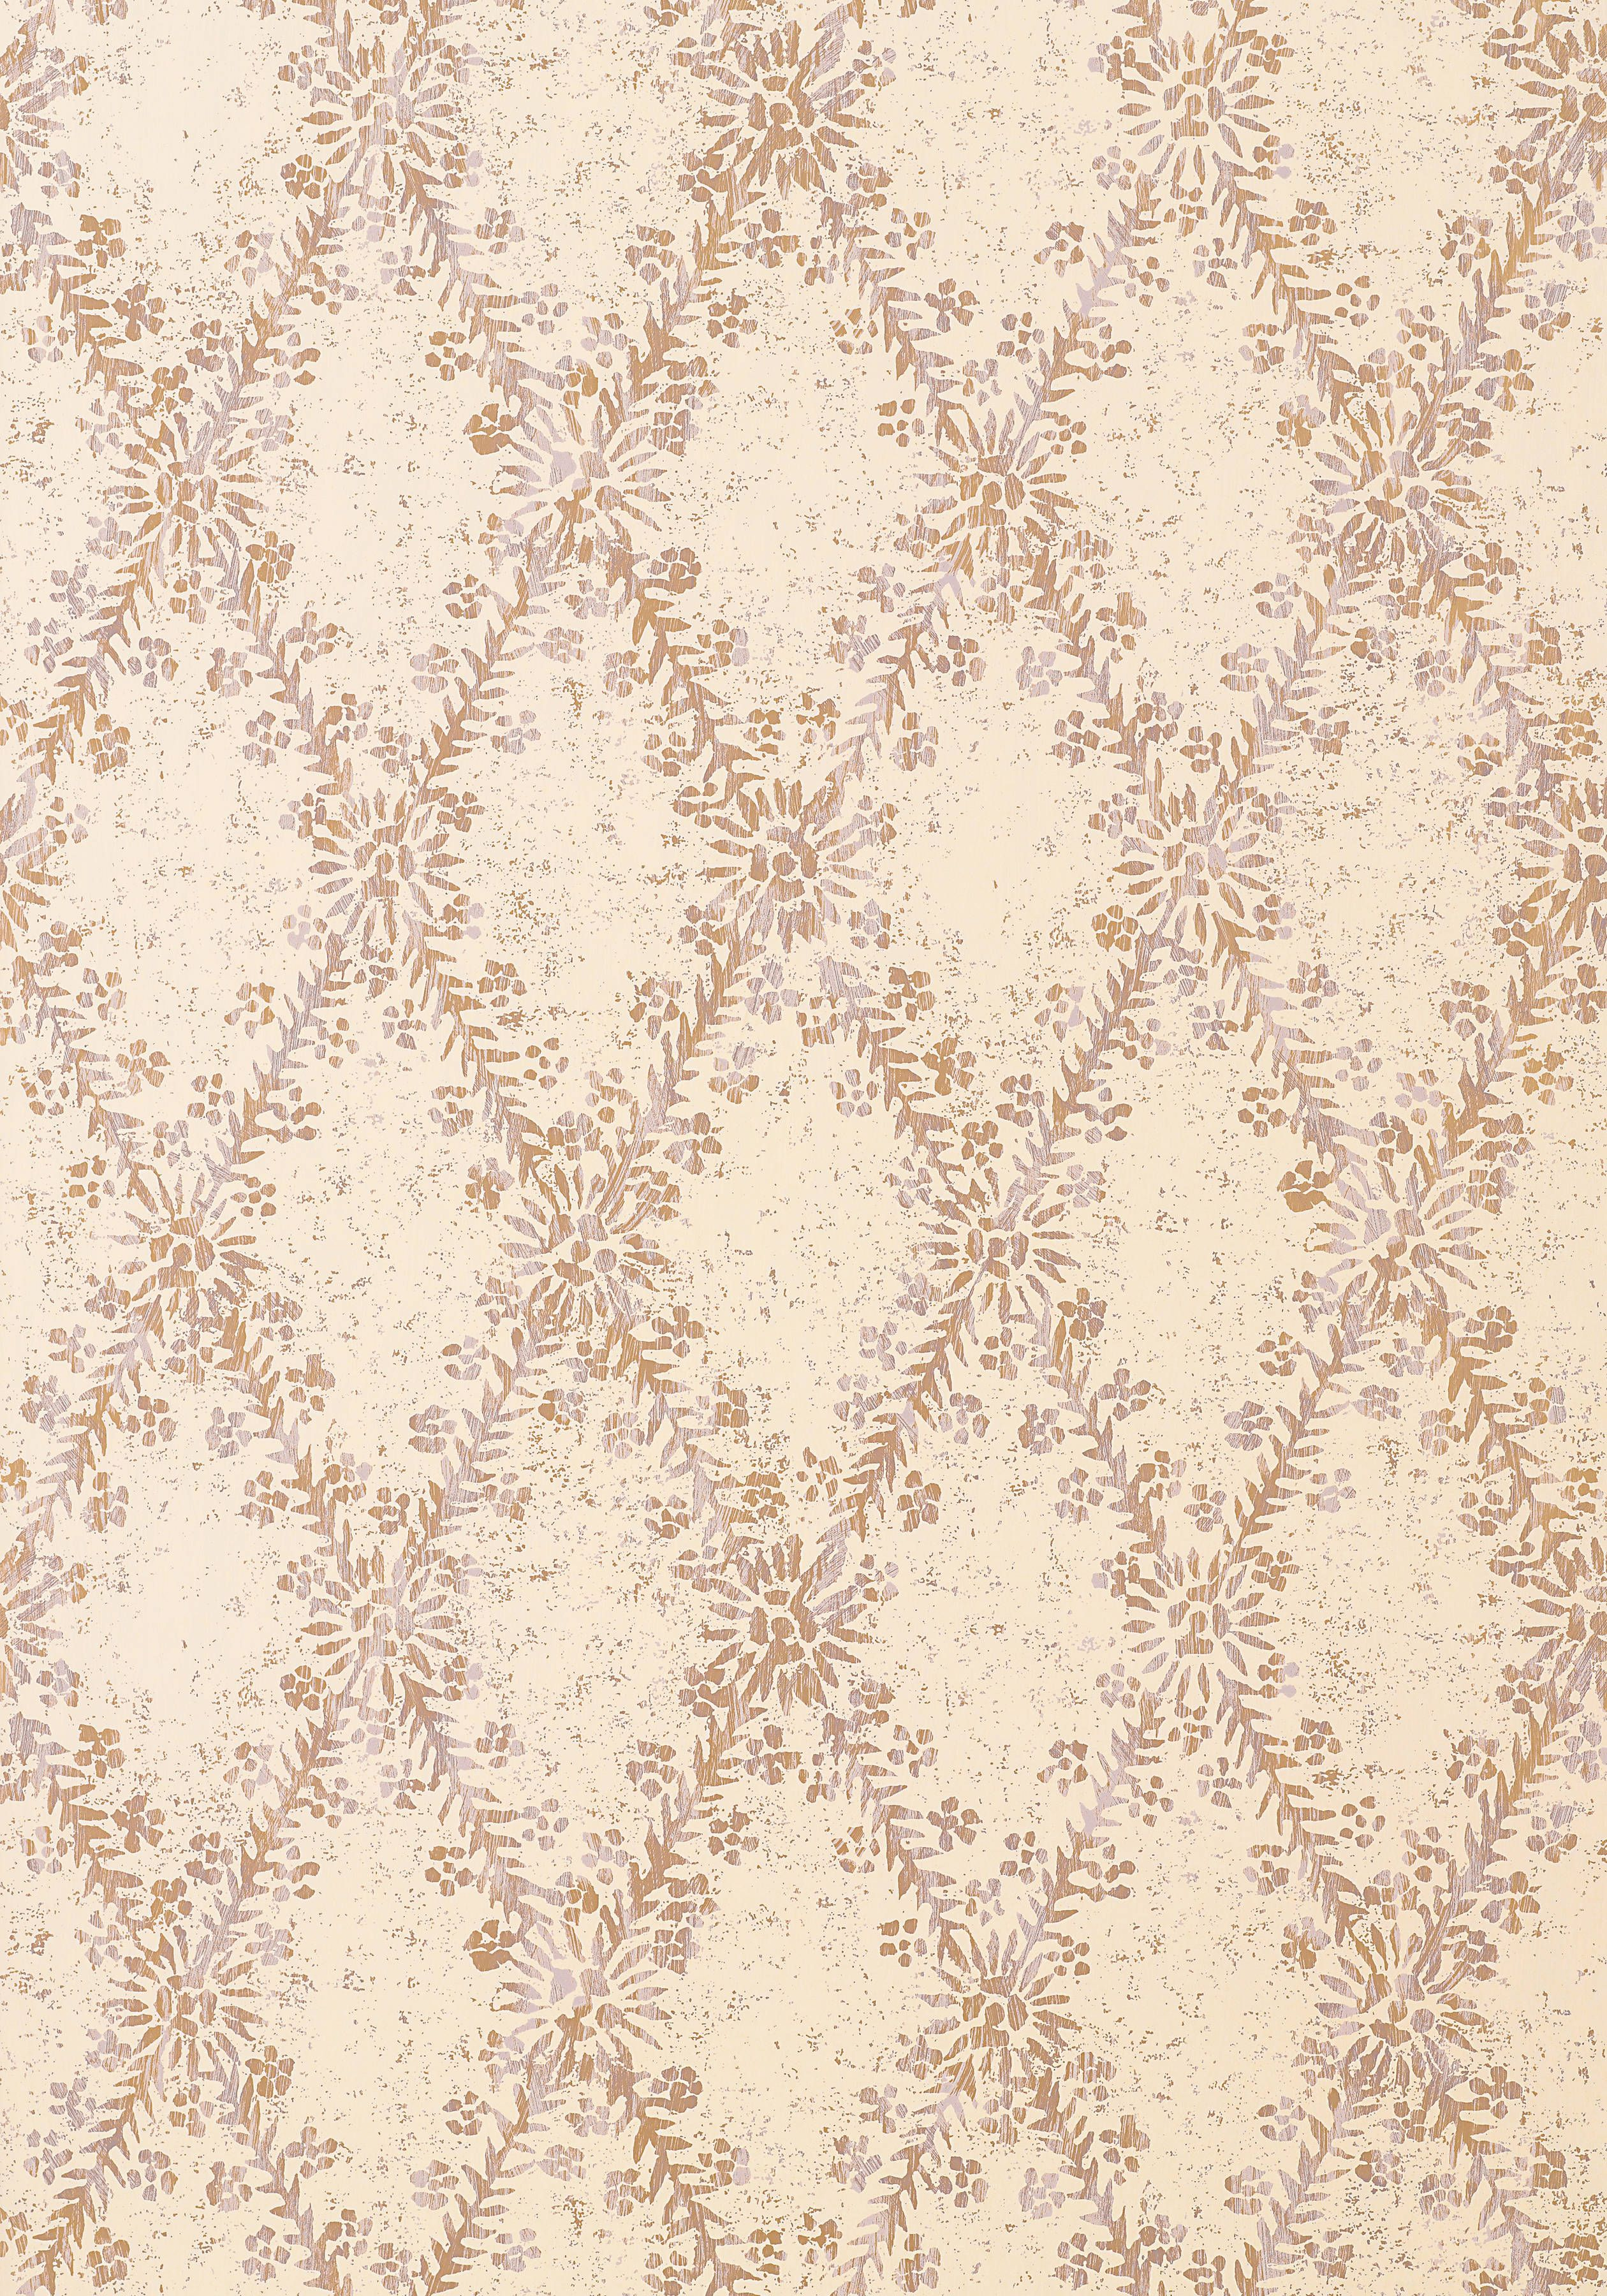 La Gioconda Plum T769 Collection Artisan From Thibaut Trendy  # La Gioconda Muebles